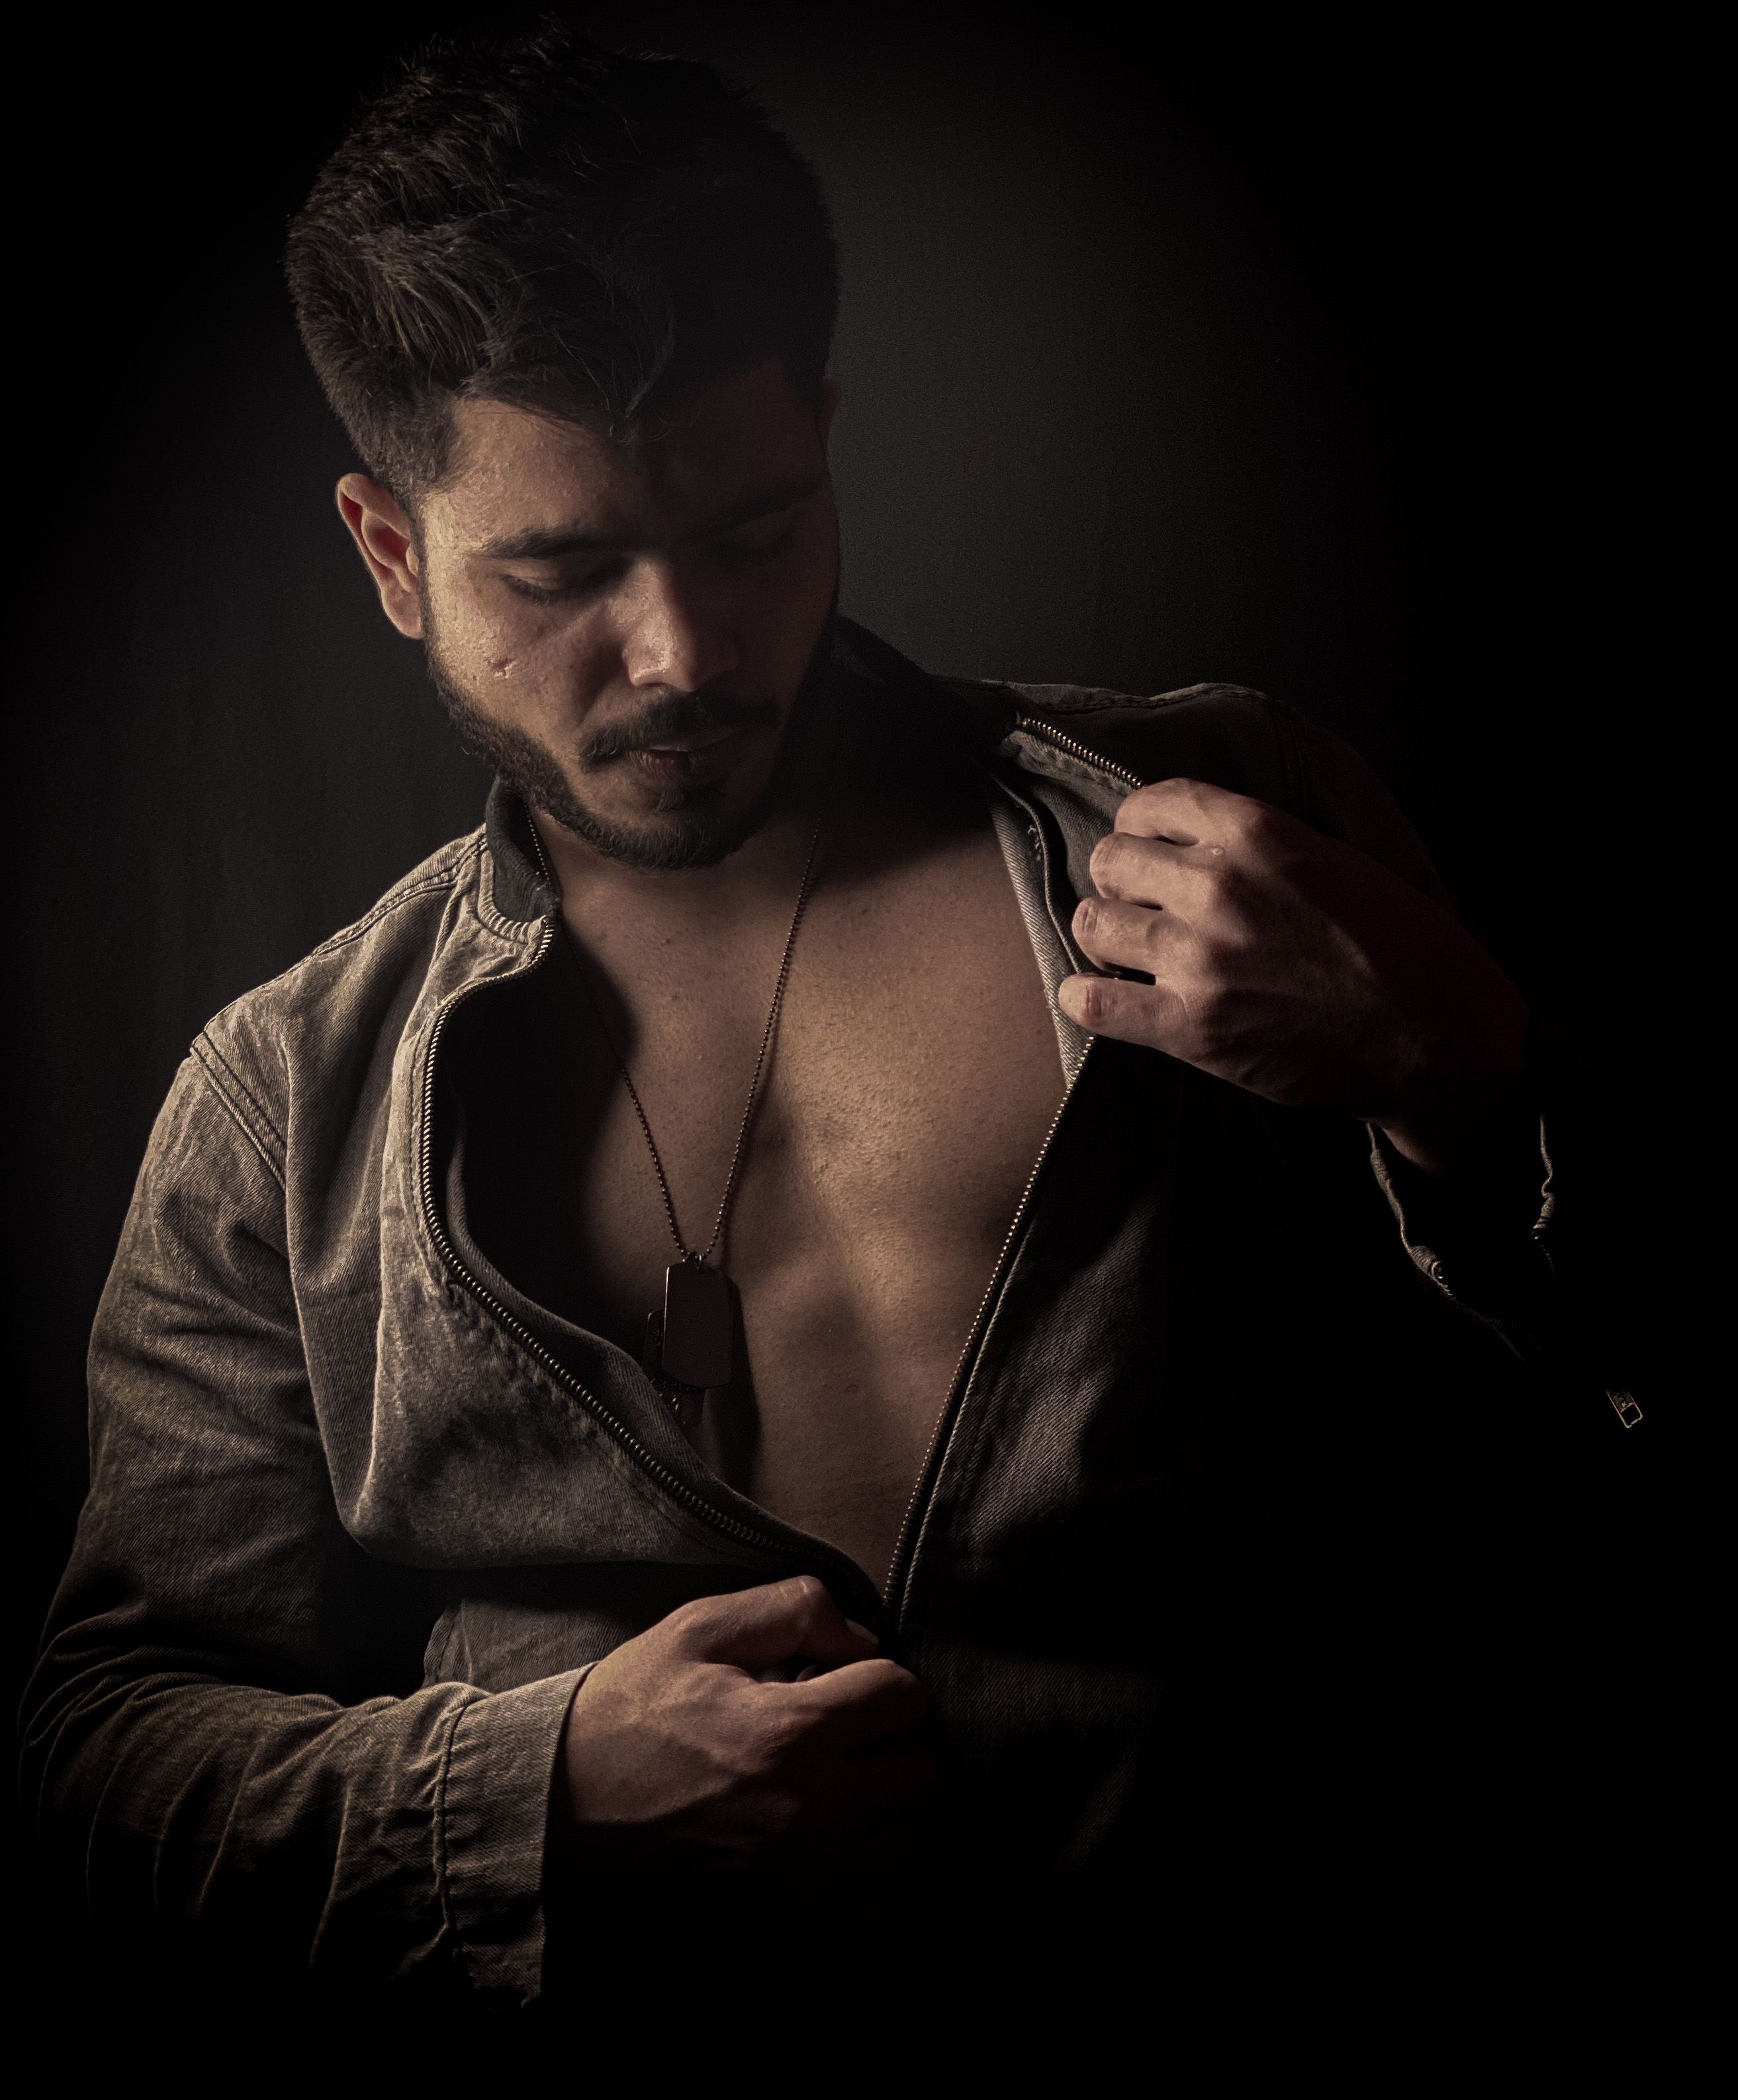 Roadster Denim Jacket In 2020 Mens Photoshoot Poses Best Poses For Men Photography Poses For Men